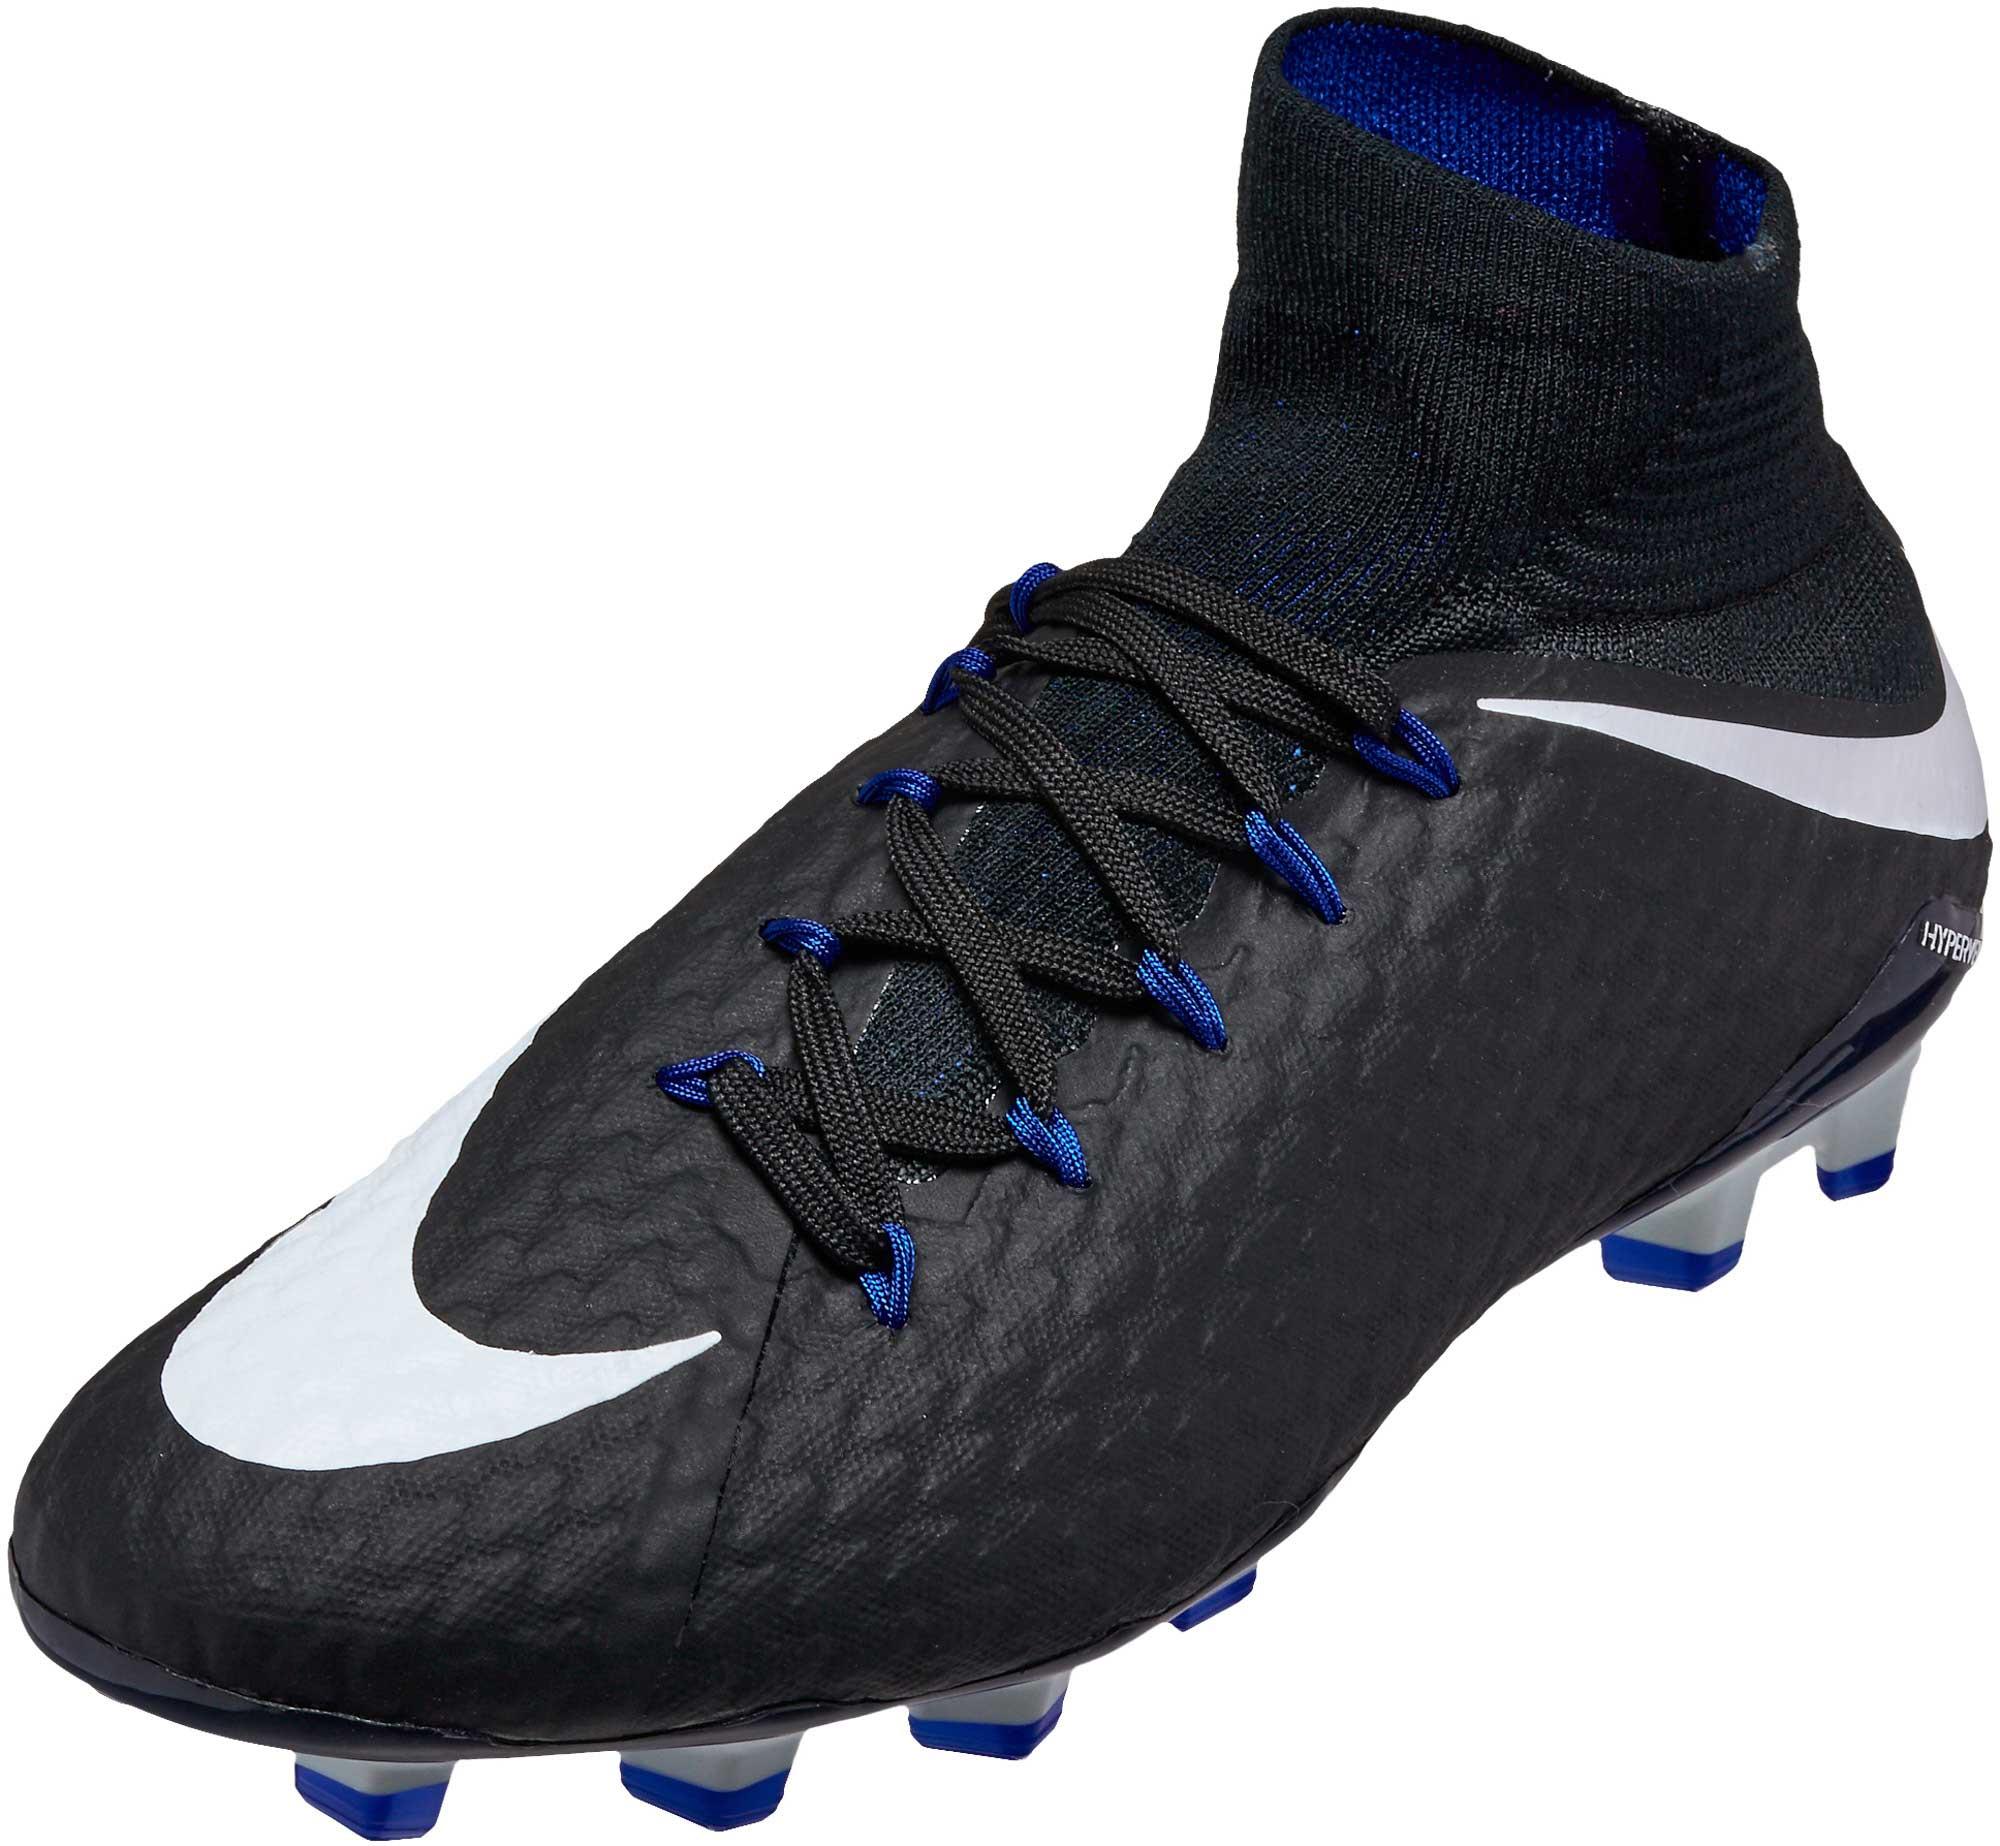 pretty nice dc50f 3523e Nike Hypervenom Phatal III DF FG Soccer Cleats - Black & White